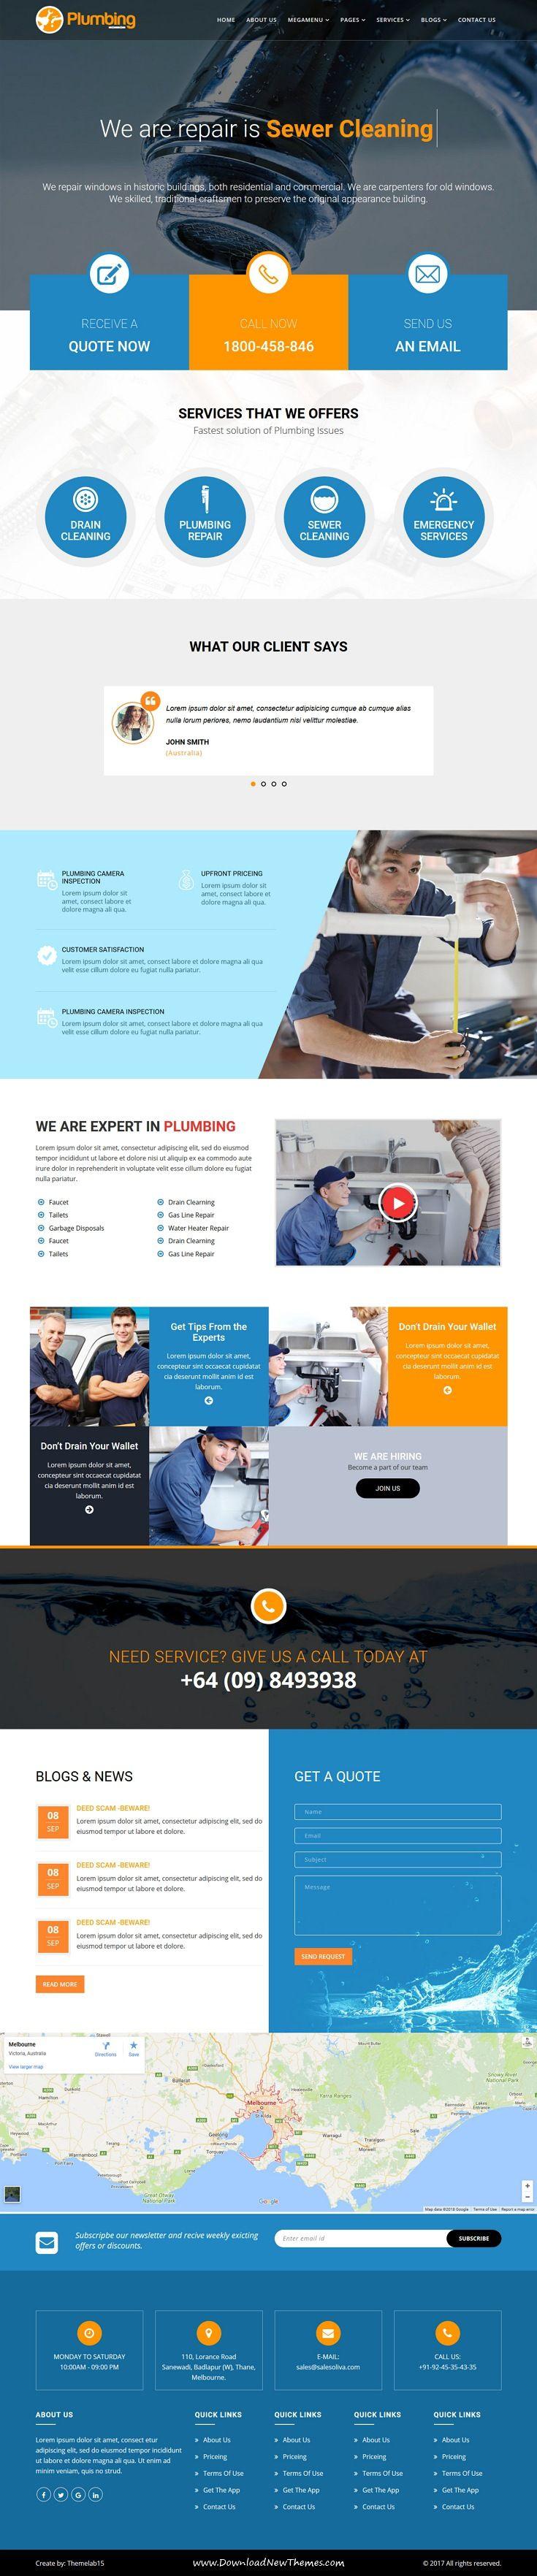 Plumbia Company Html Template Web Layout Design Web Design Services Flat Web Design